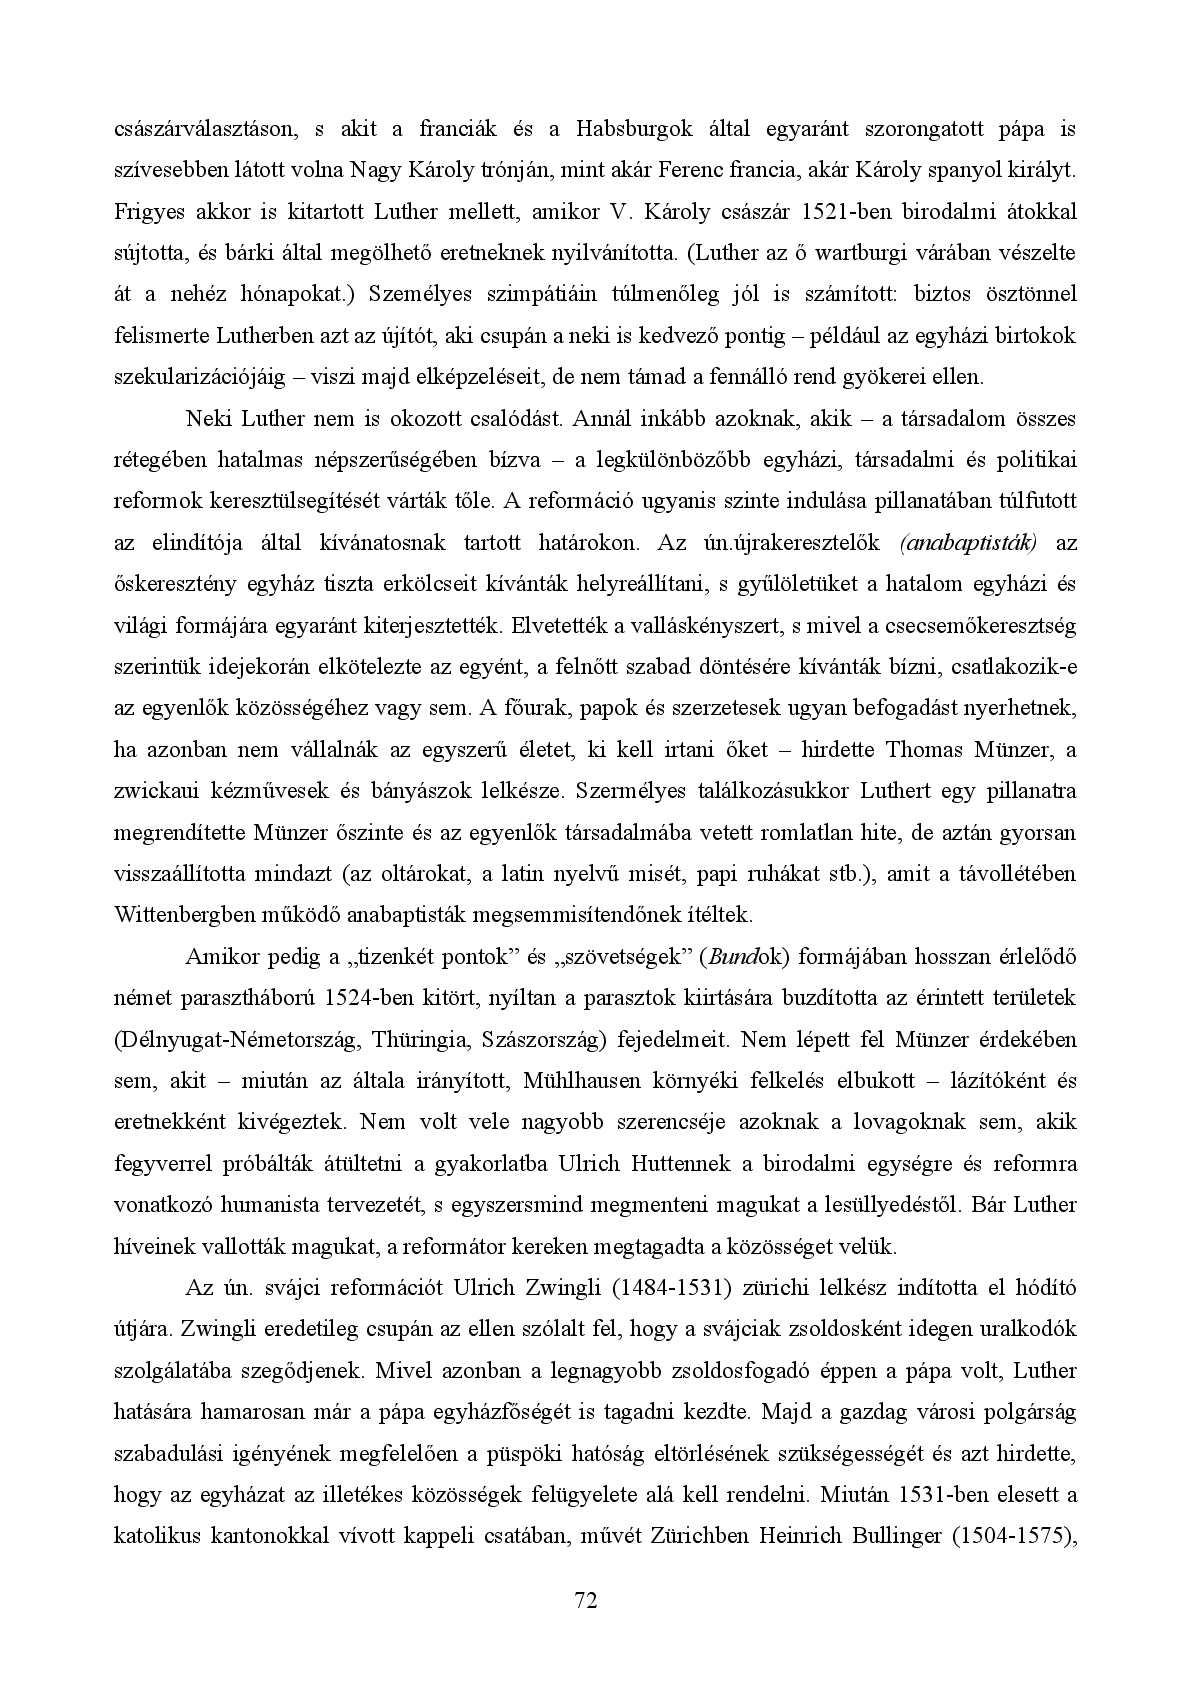 Visszafejtés - Reverse engineering - zuii.hu